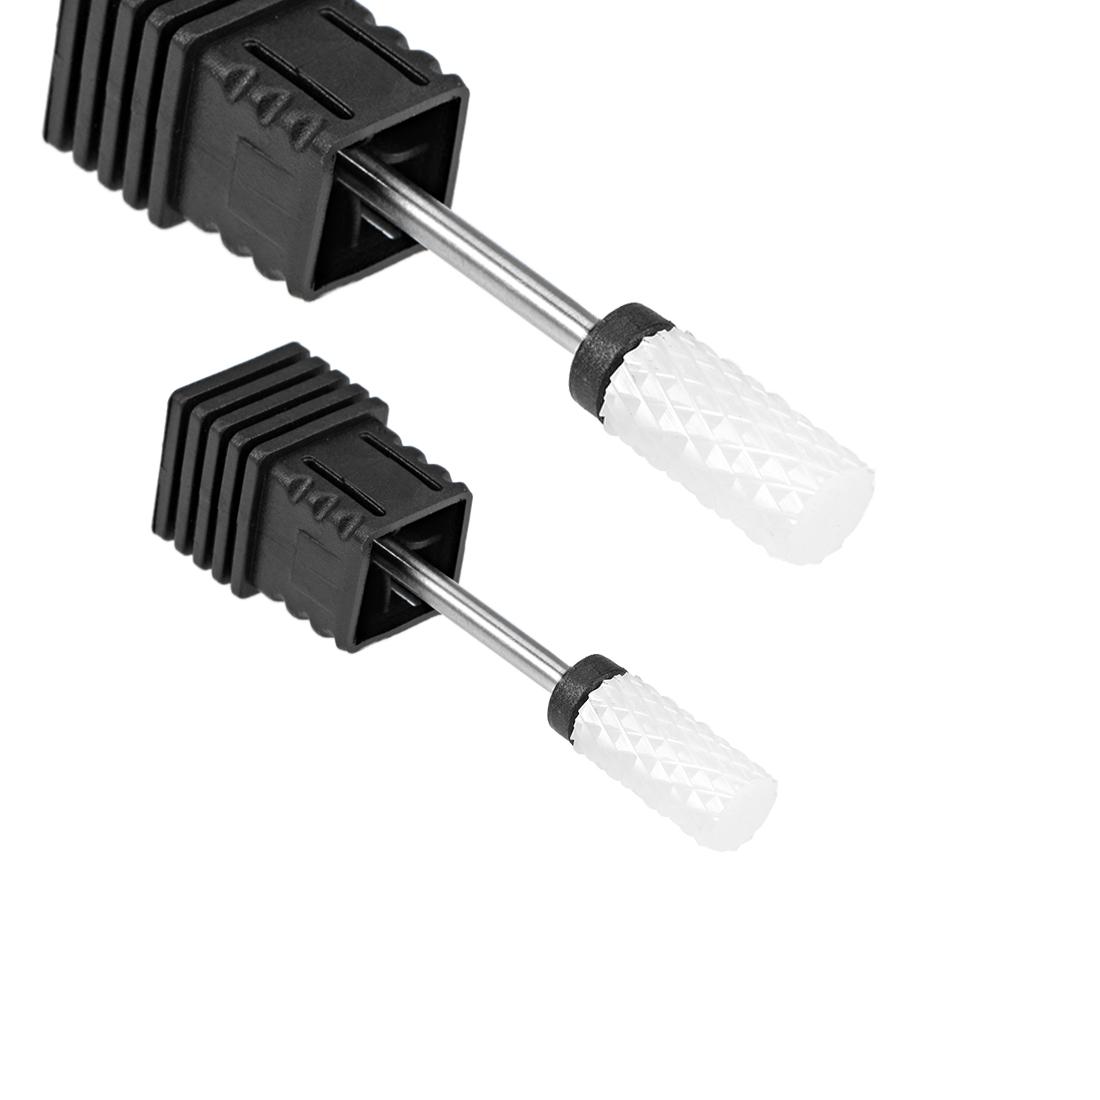 2pcs Ceramic Nail Drill Bits 3/32 inch (Extra Coarse Grit) for Manicure Pedicure